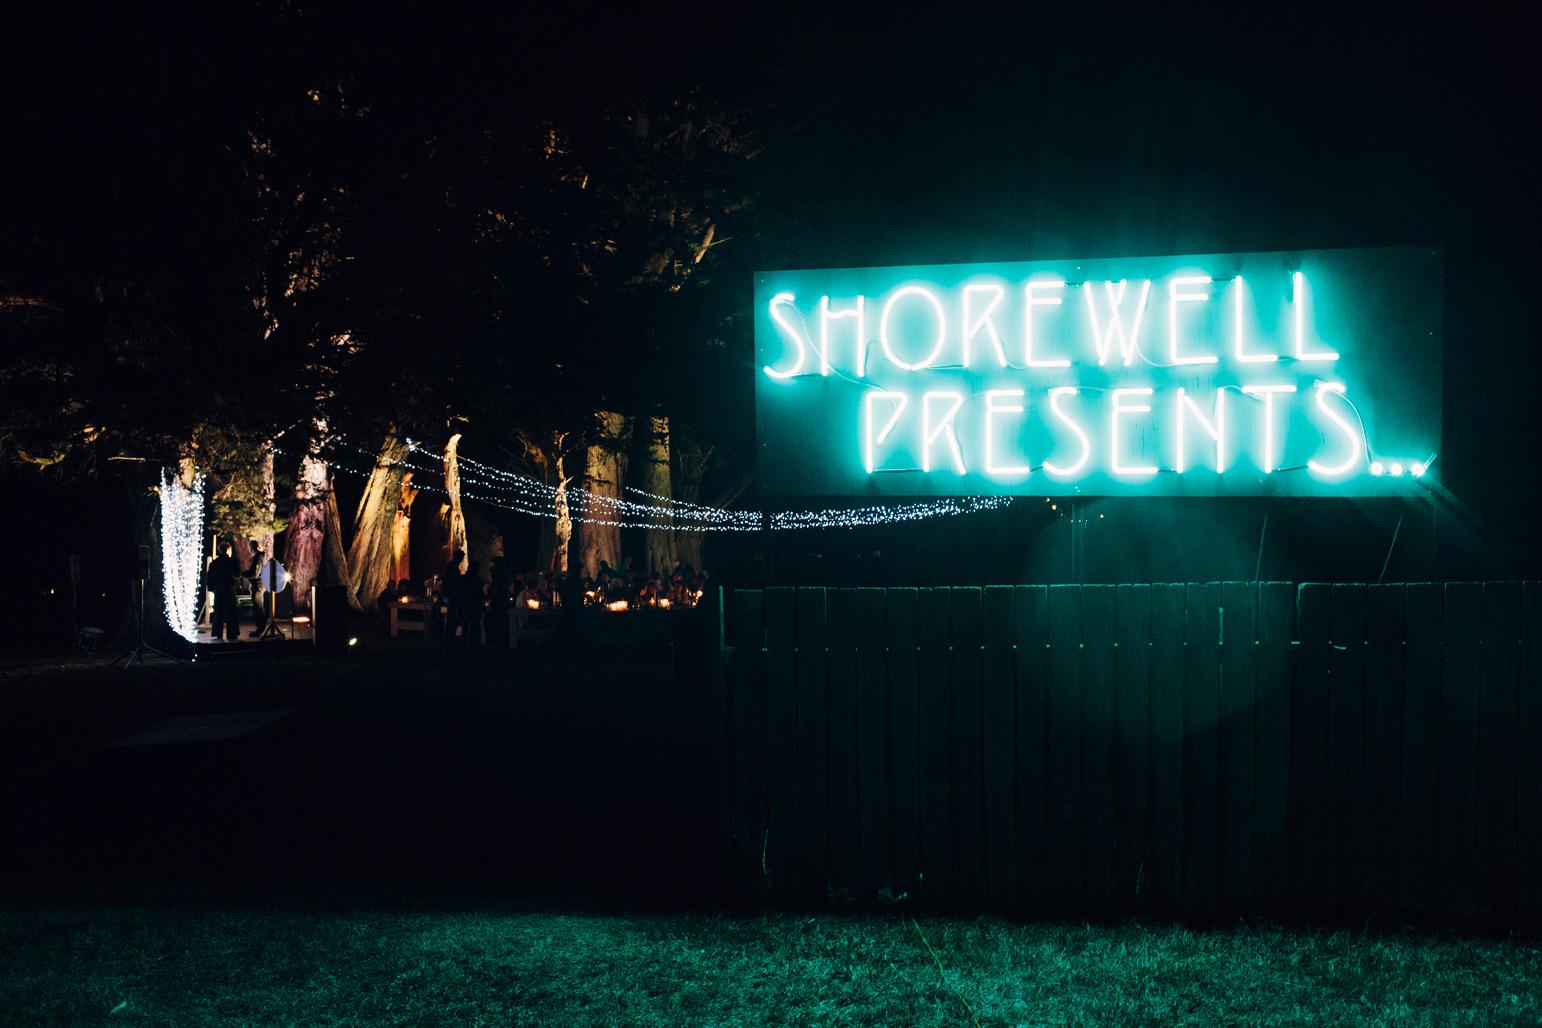 Shorewell Presents